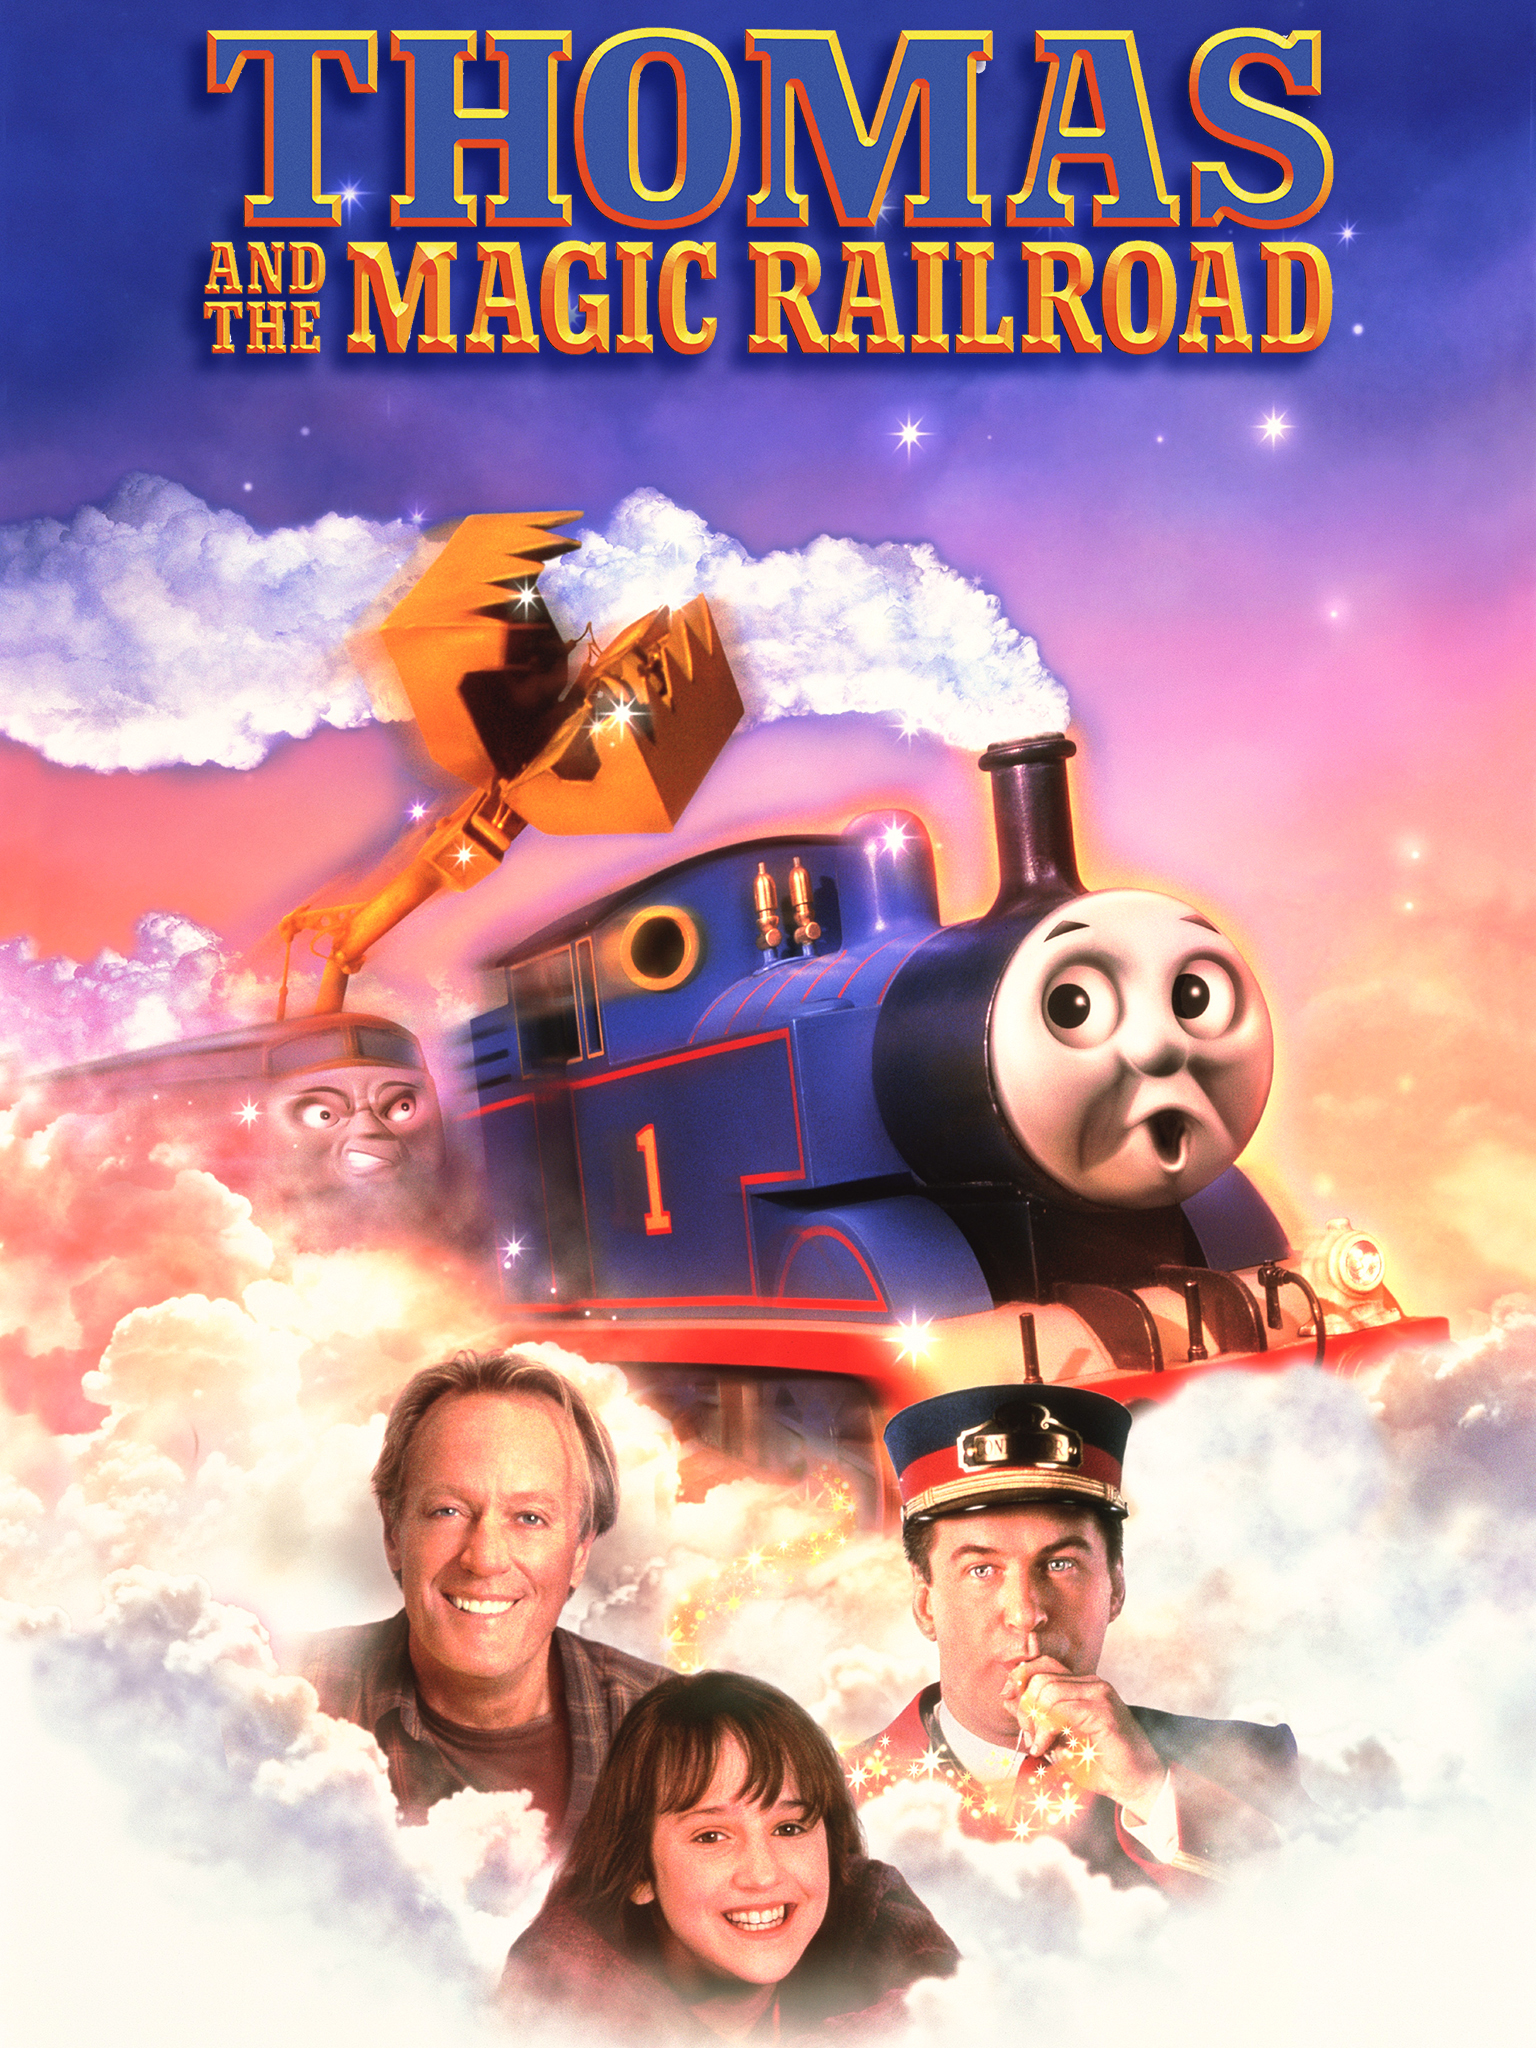 thomas and the magic railroad thomas the tank engine wikia thomas and the magic railroad thomas the tank engine wikia fandom powered by wikia